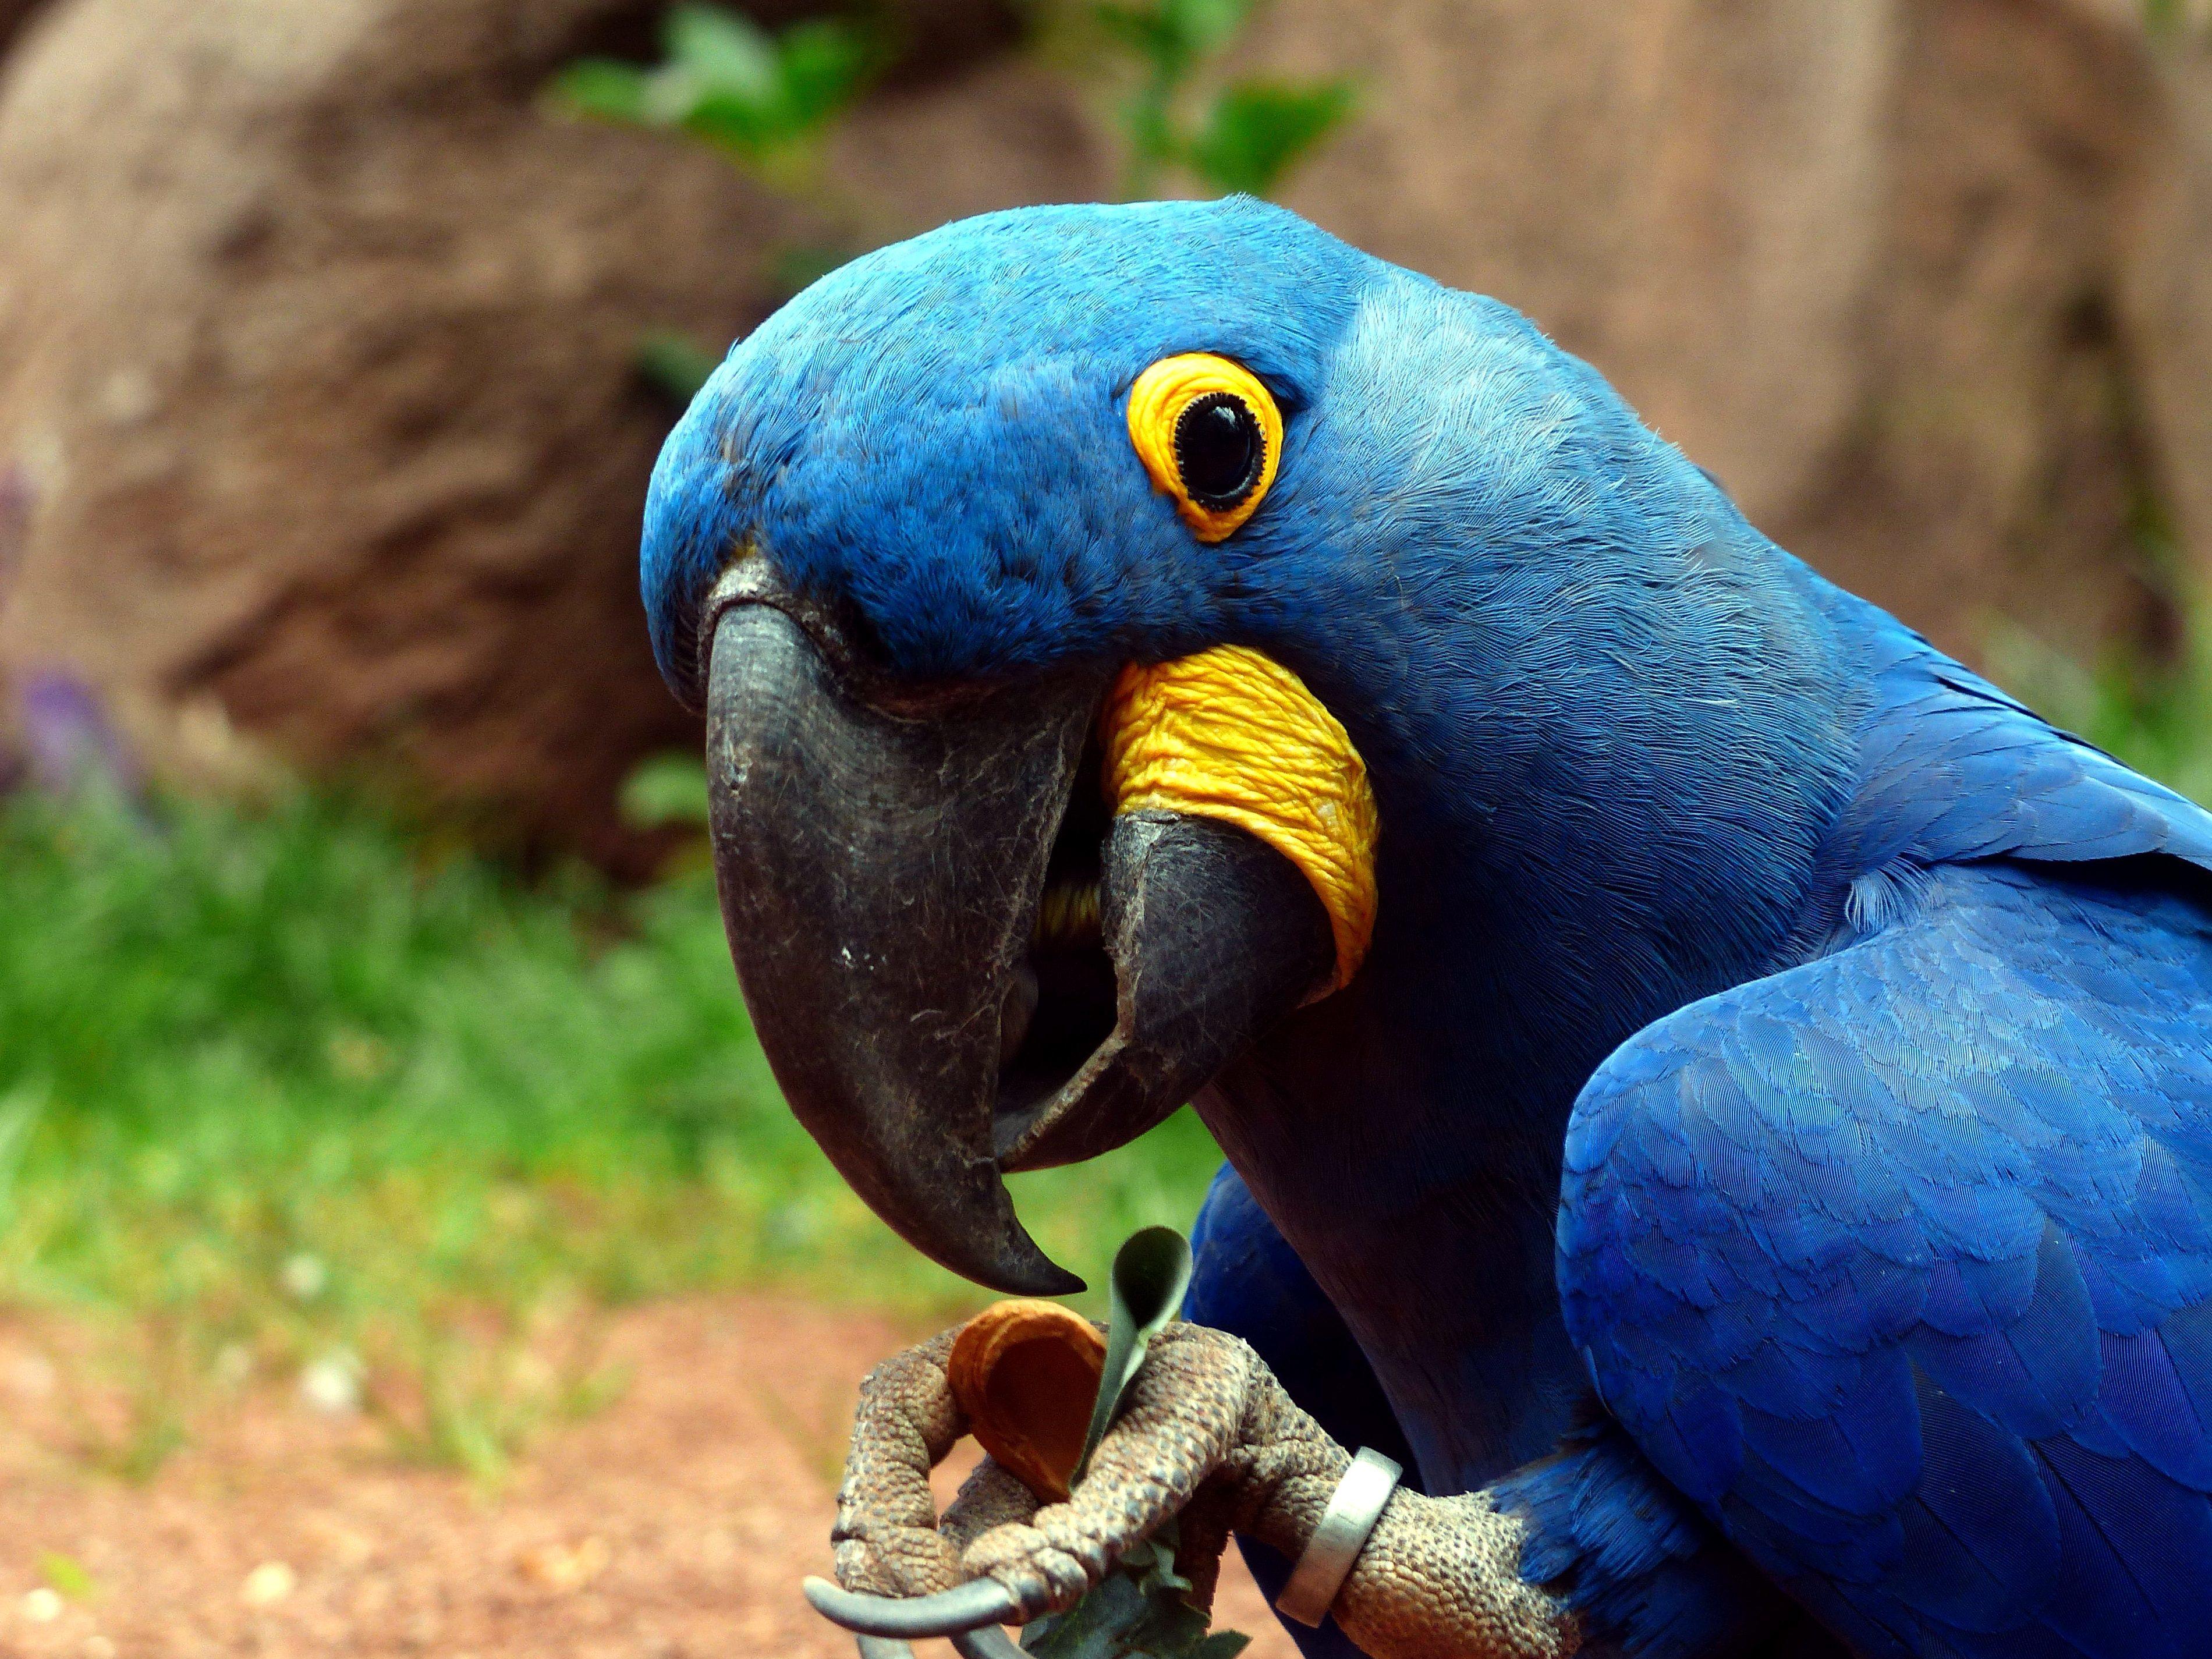 фото птиц разных стран мира